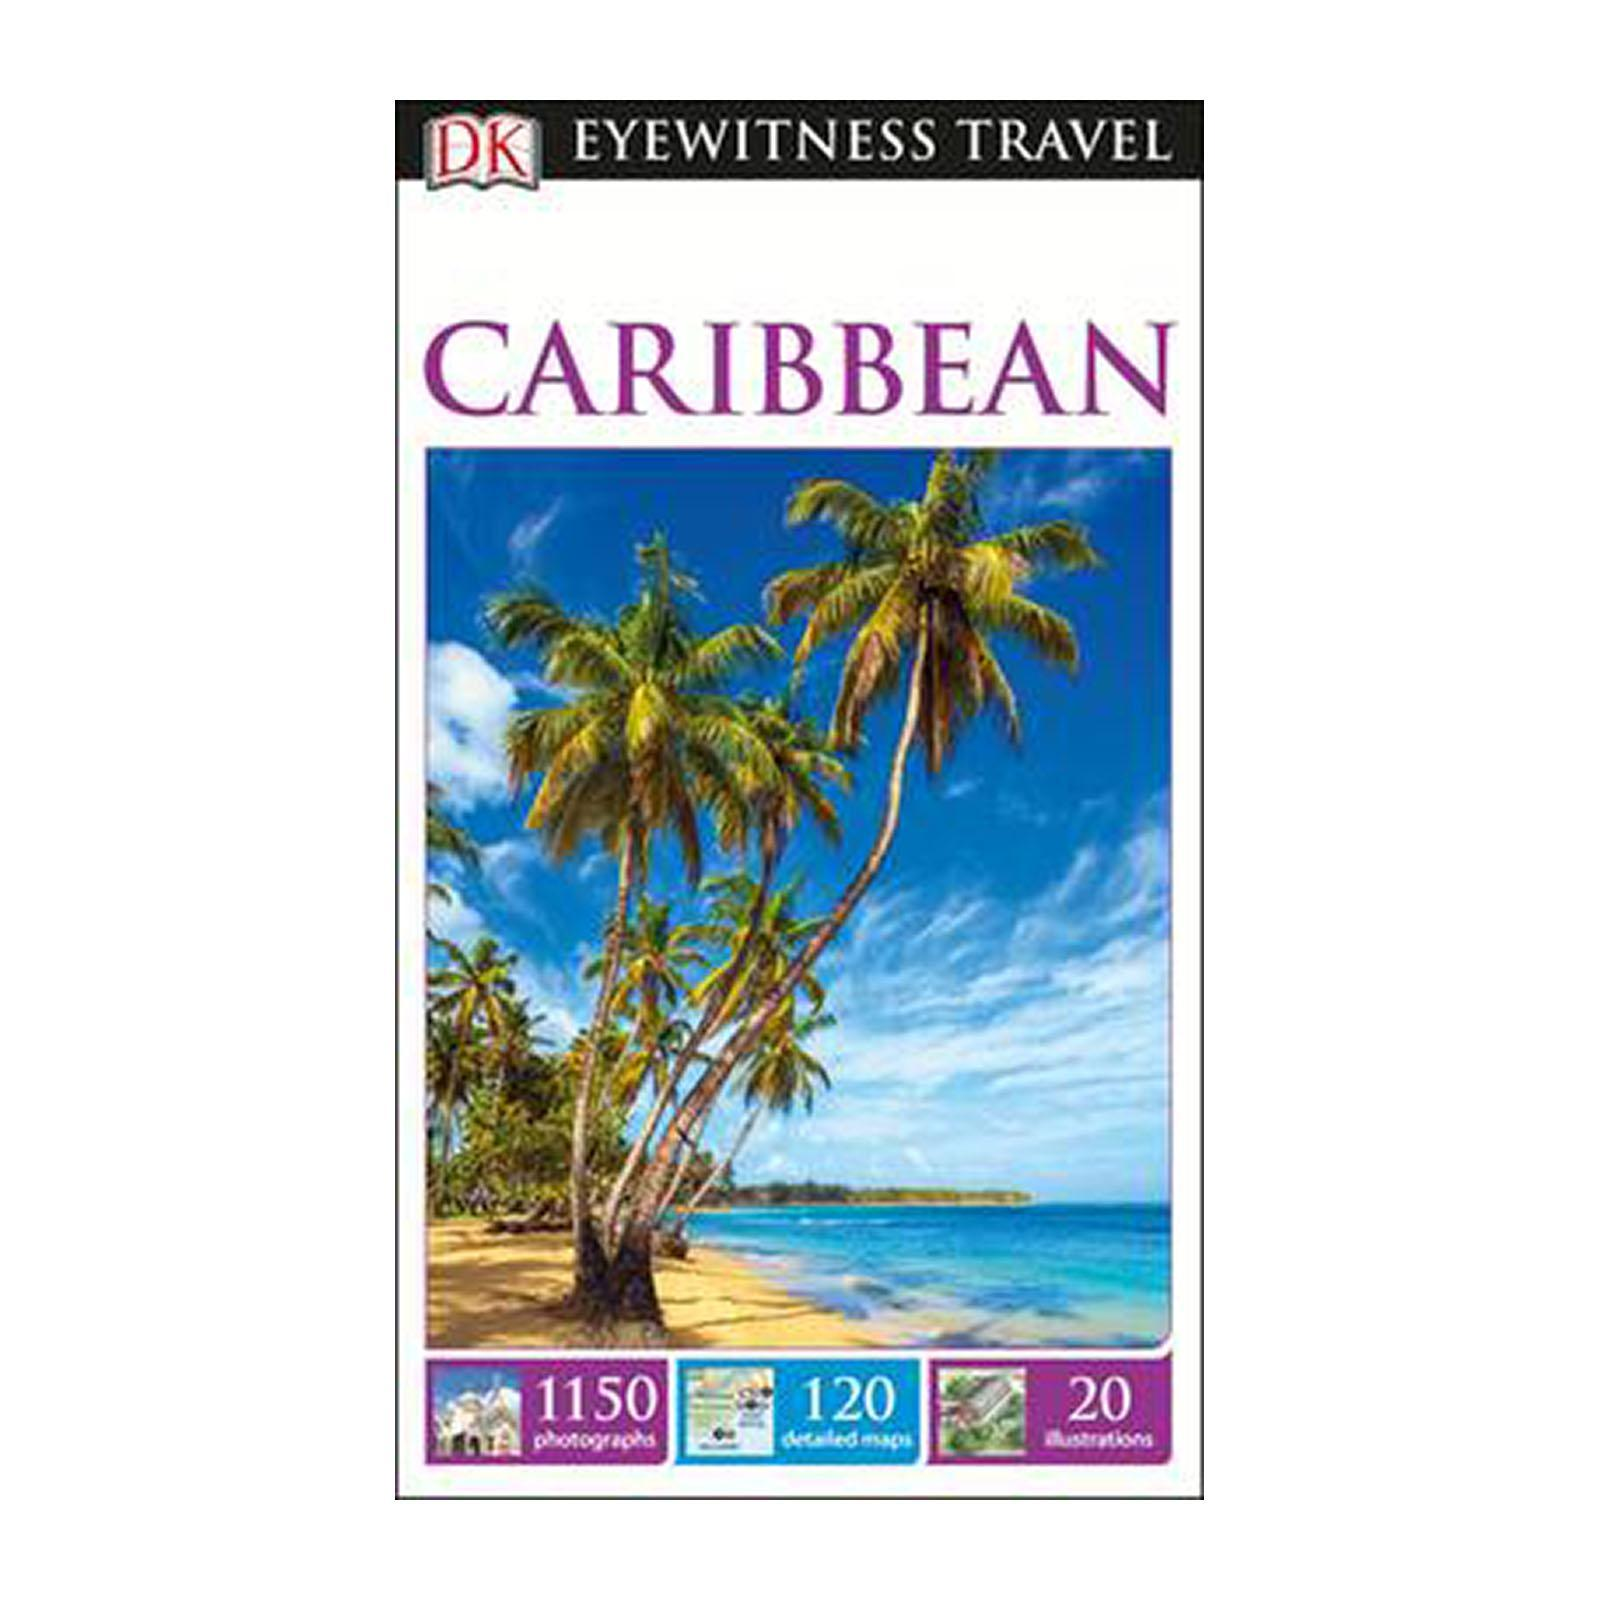 Dk Eyewitness Travel Guide Caribbean (Paperback)